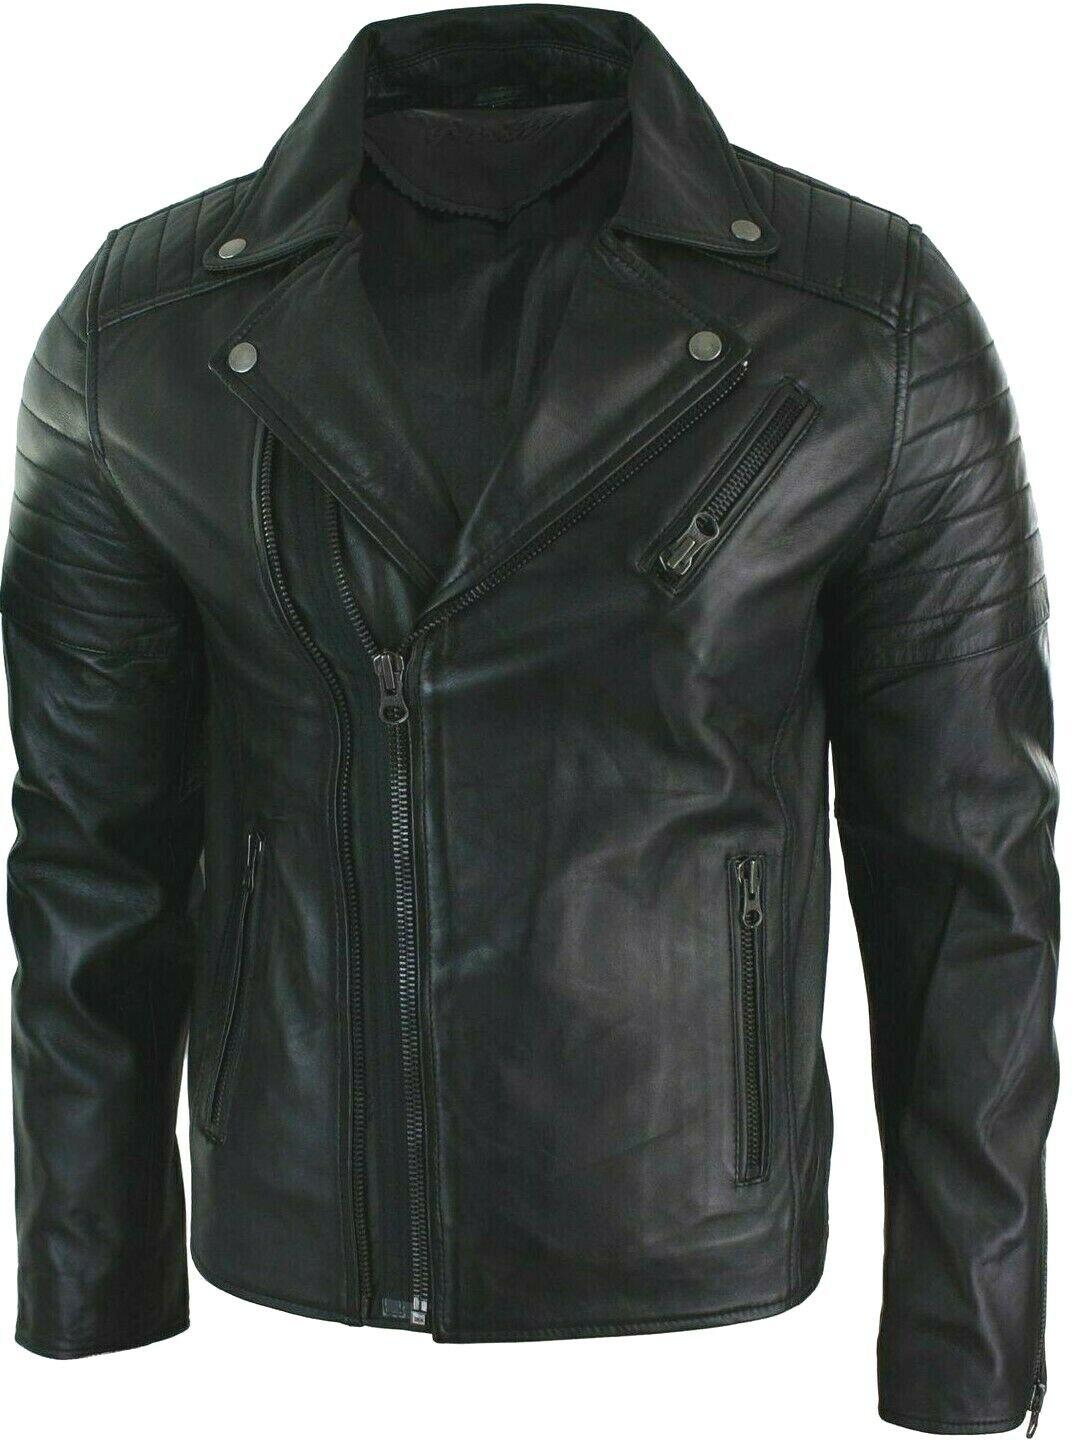 a85e4190113c New Men s Bomber Biker Vintage Black Genuine Leather Slim fi